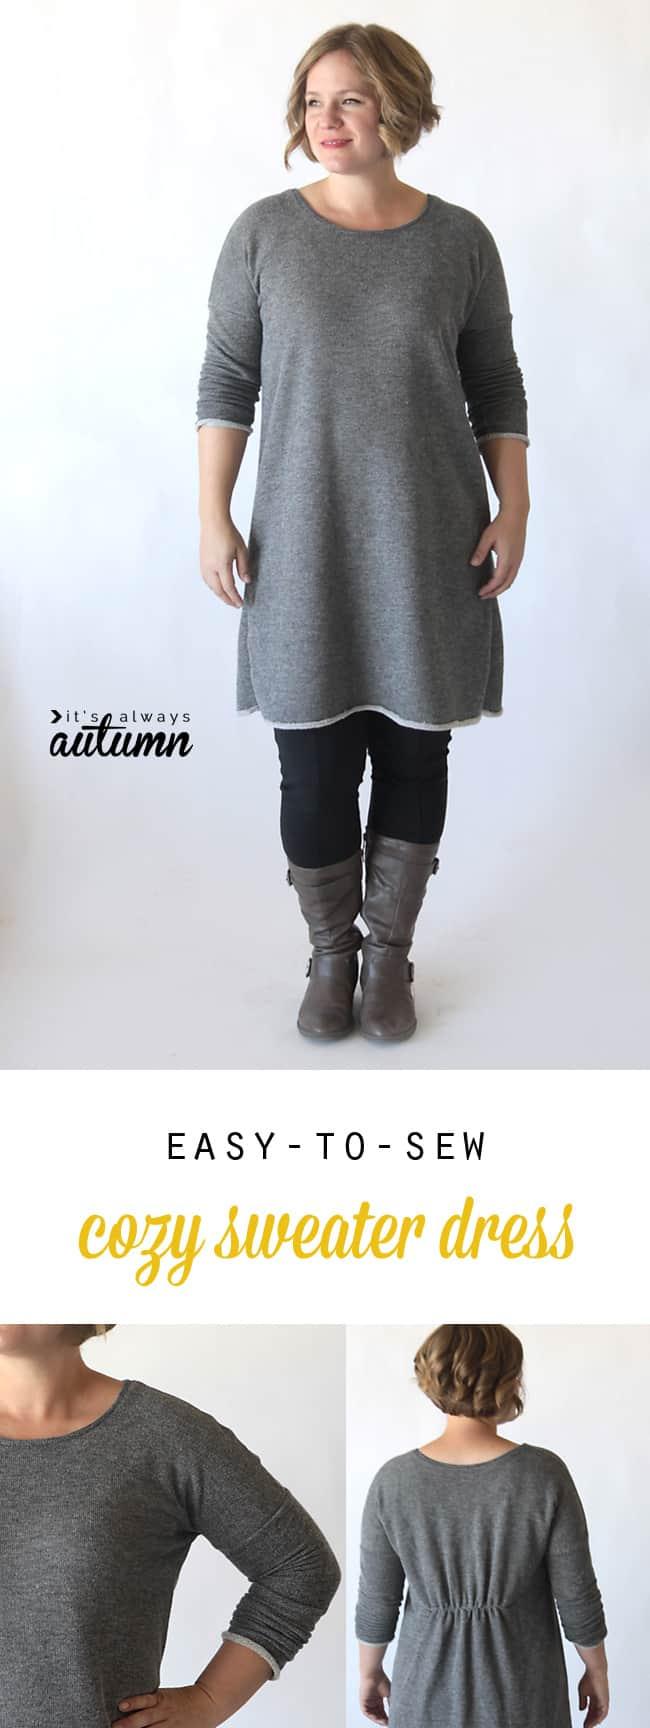 Easy-to-sew cozy sweater dress